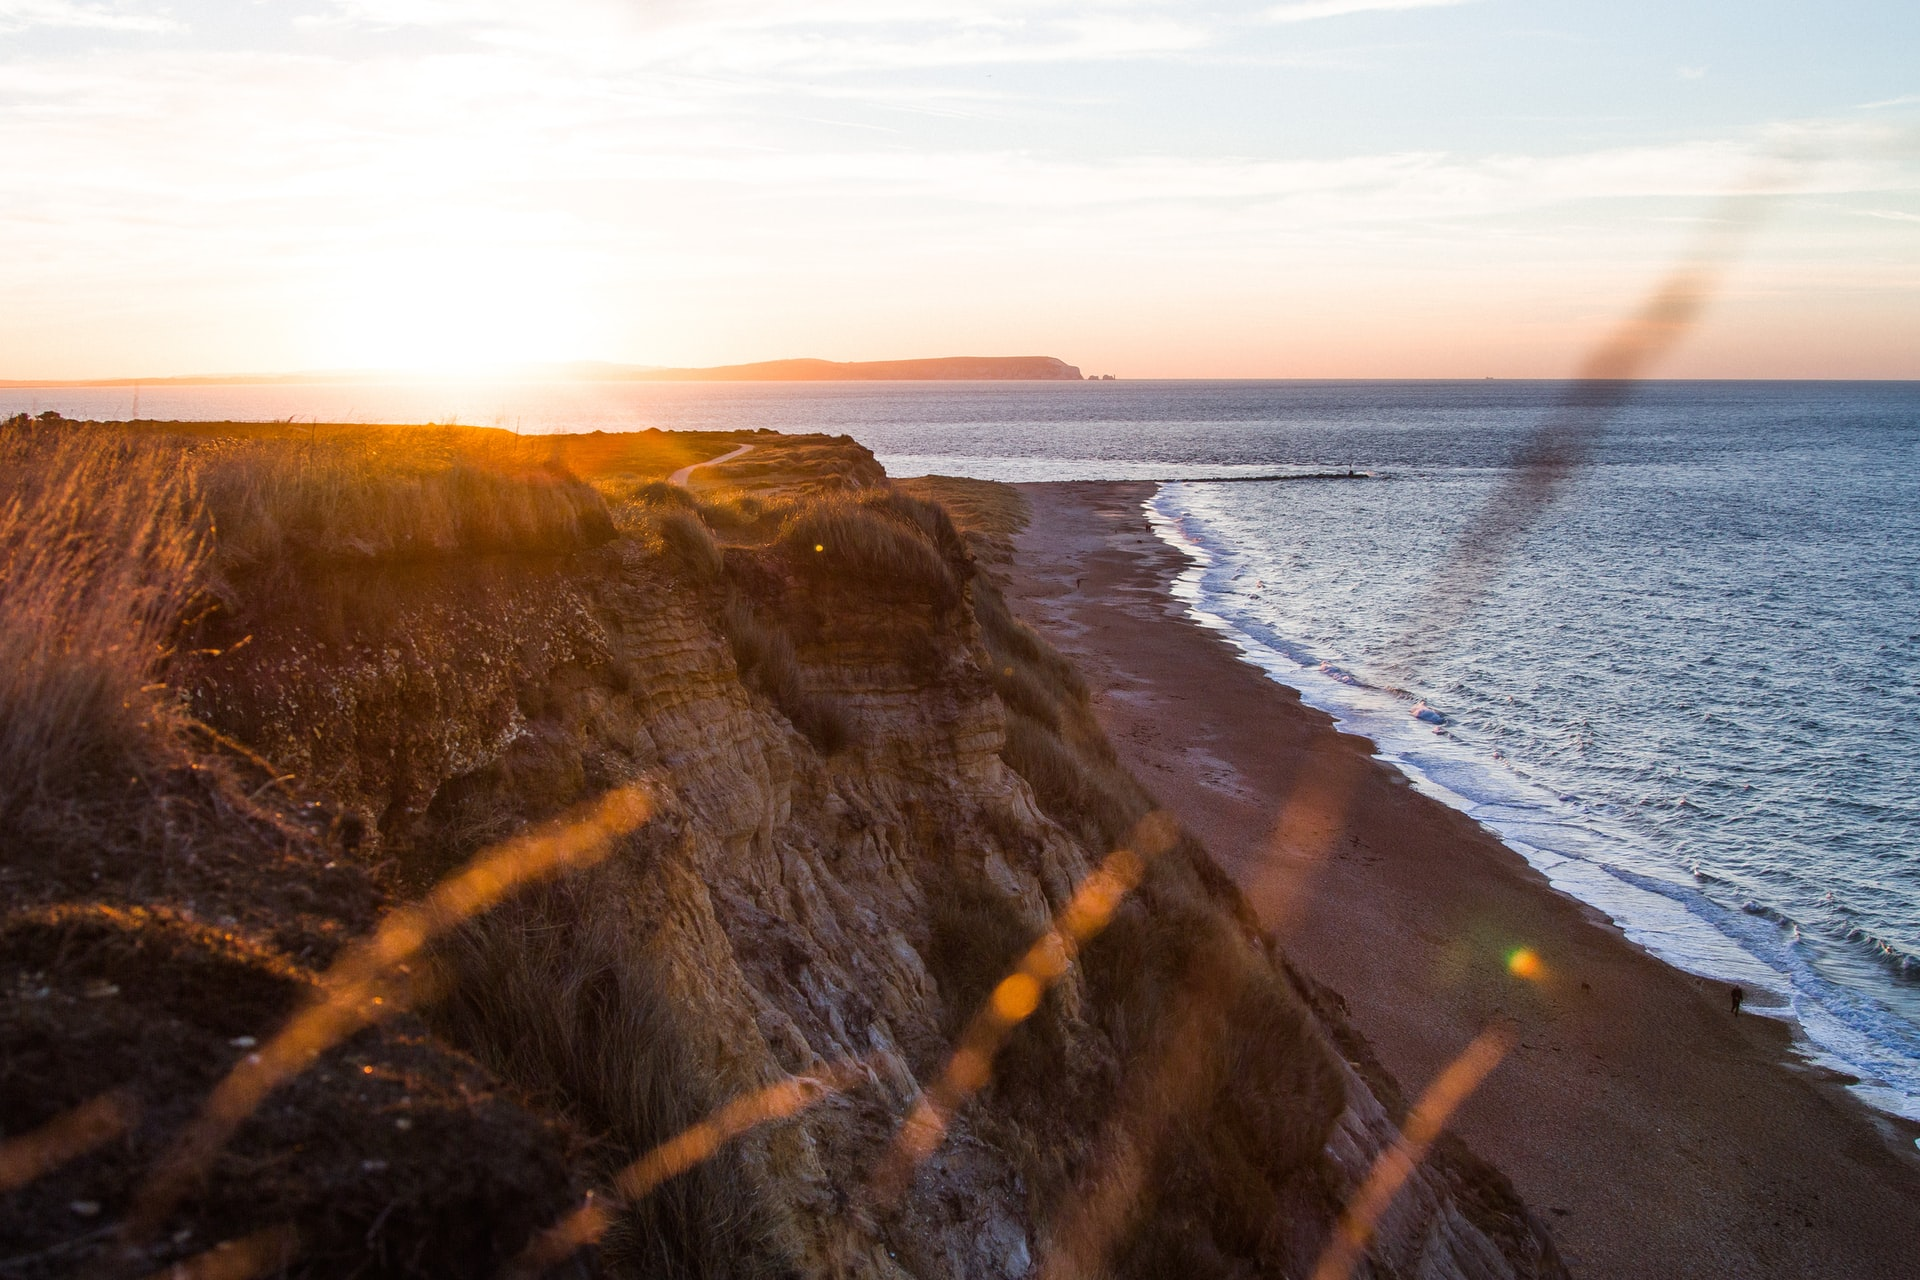 bournemouth beach plage angleterre royaume uni